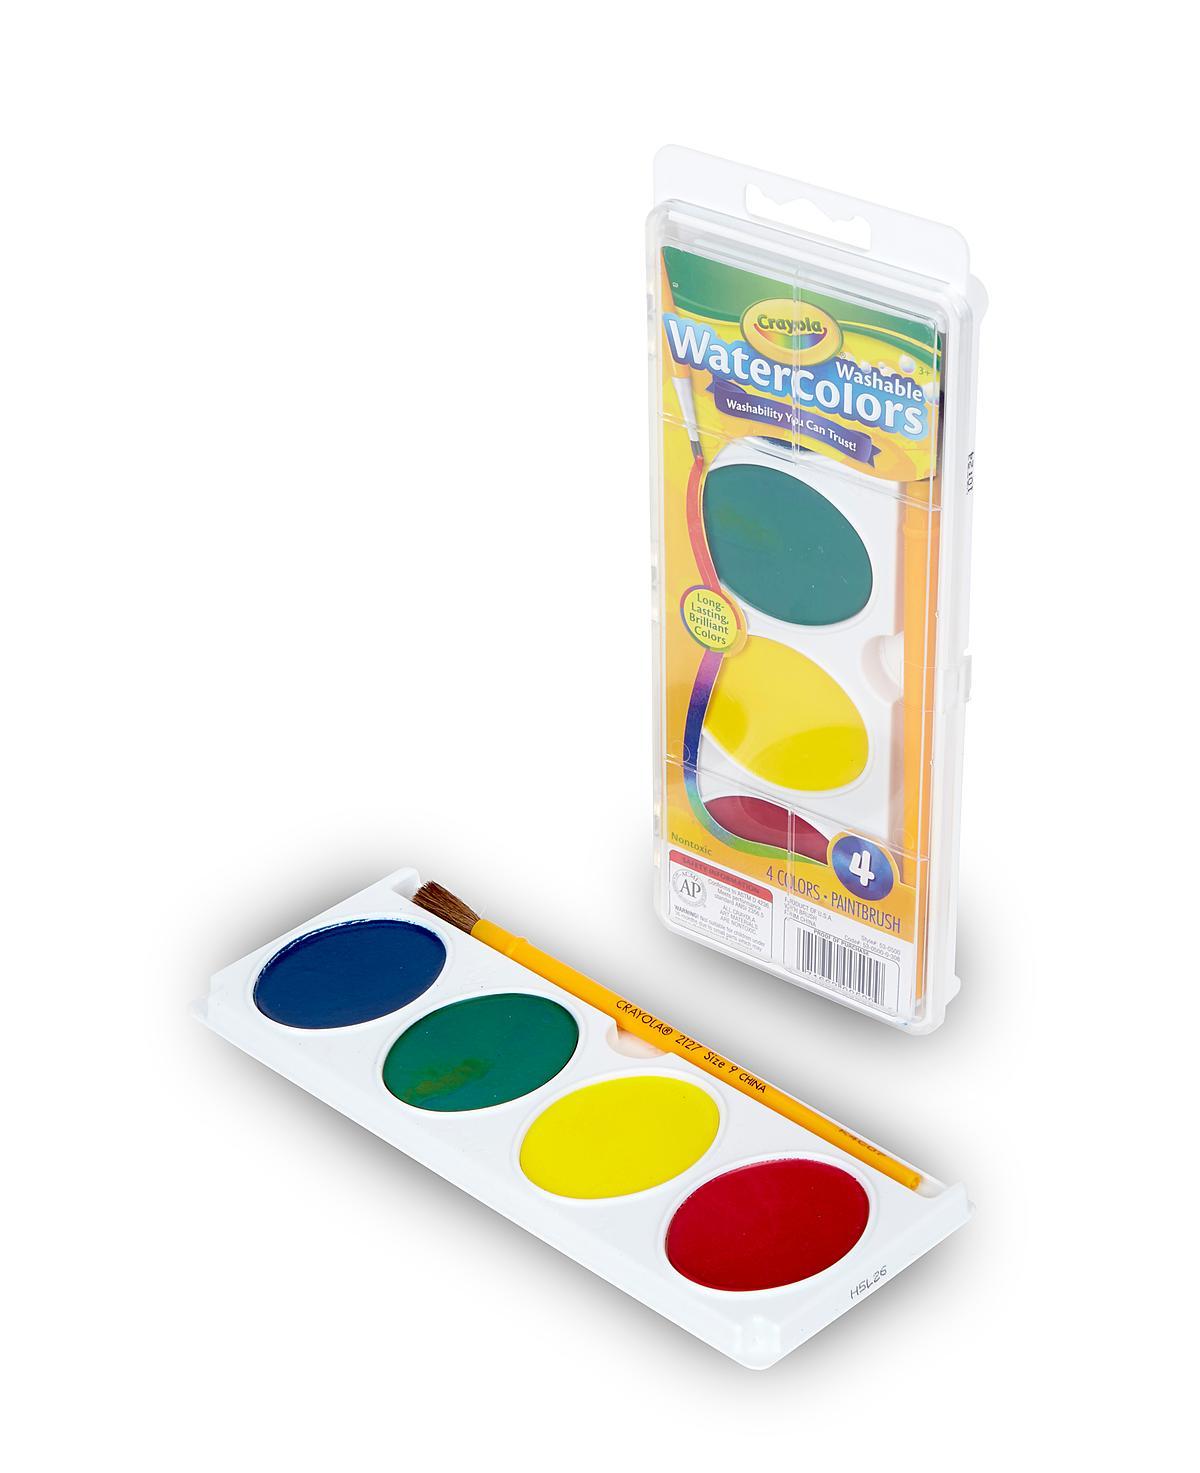 Crayola So Big Watercolor Set | MisterArt.com